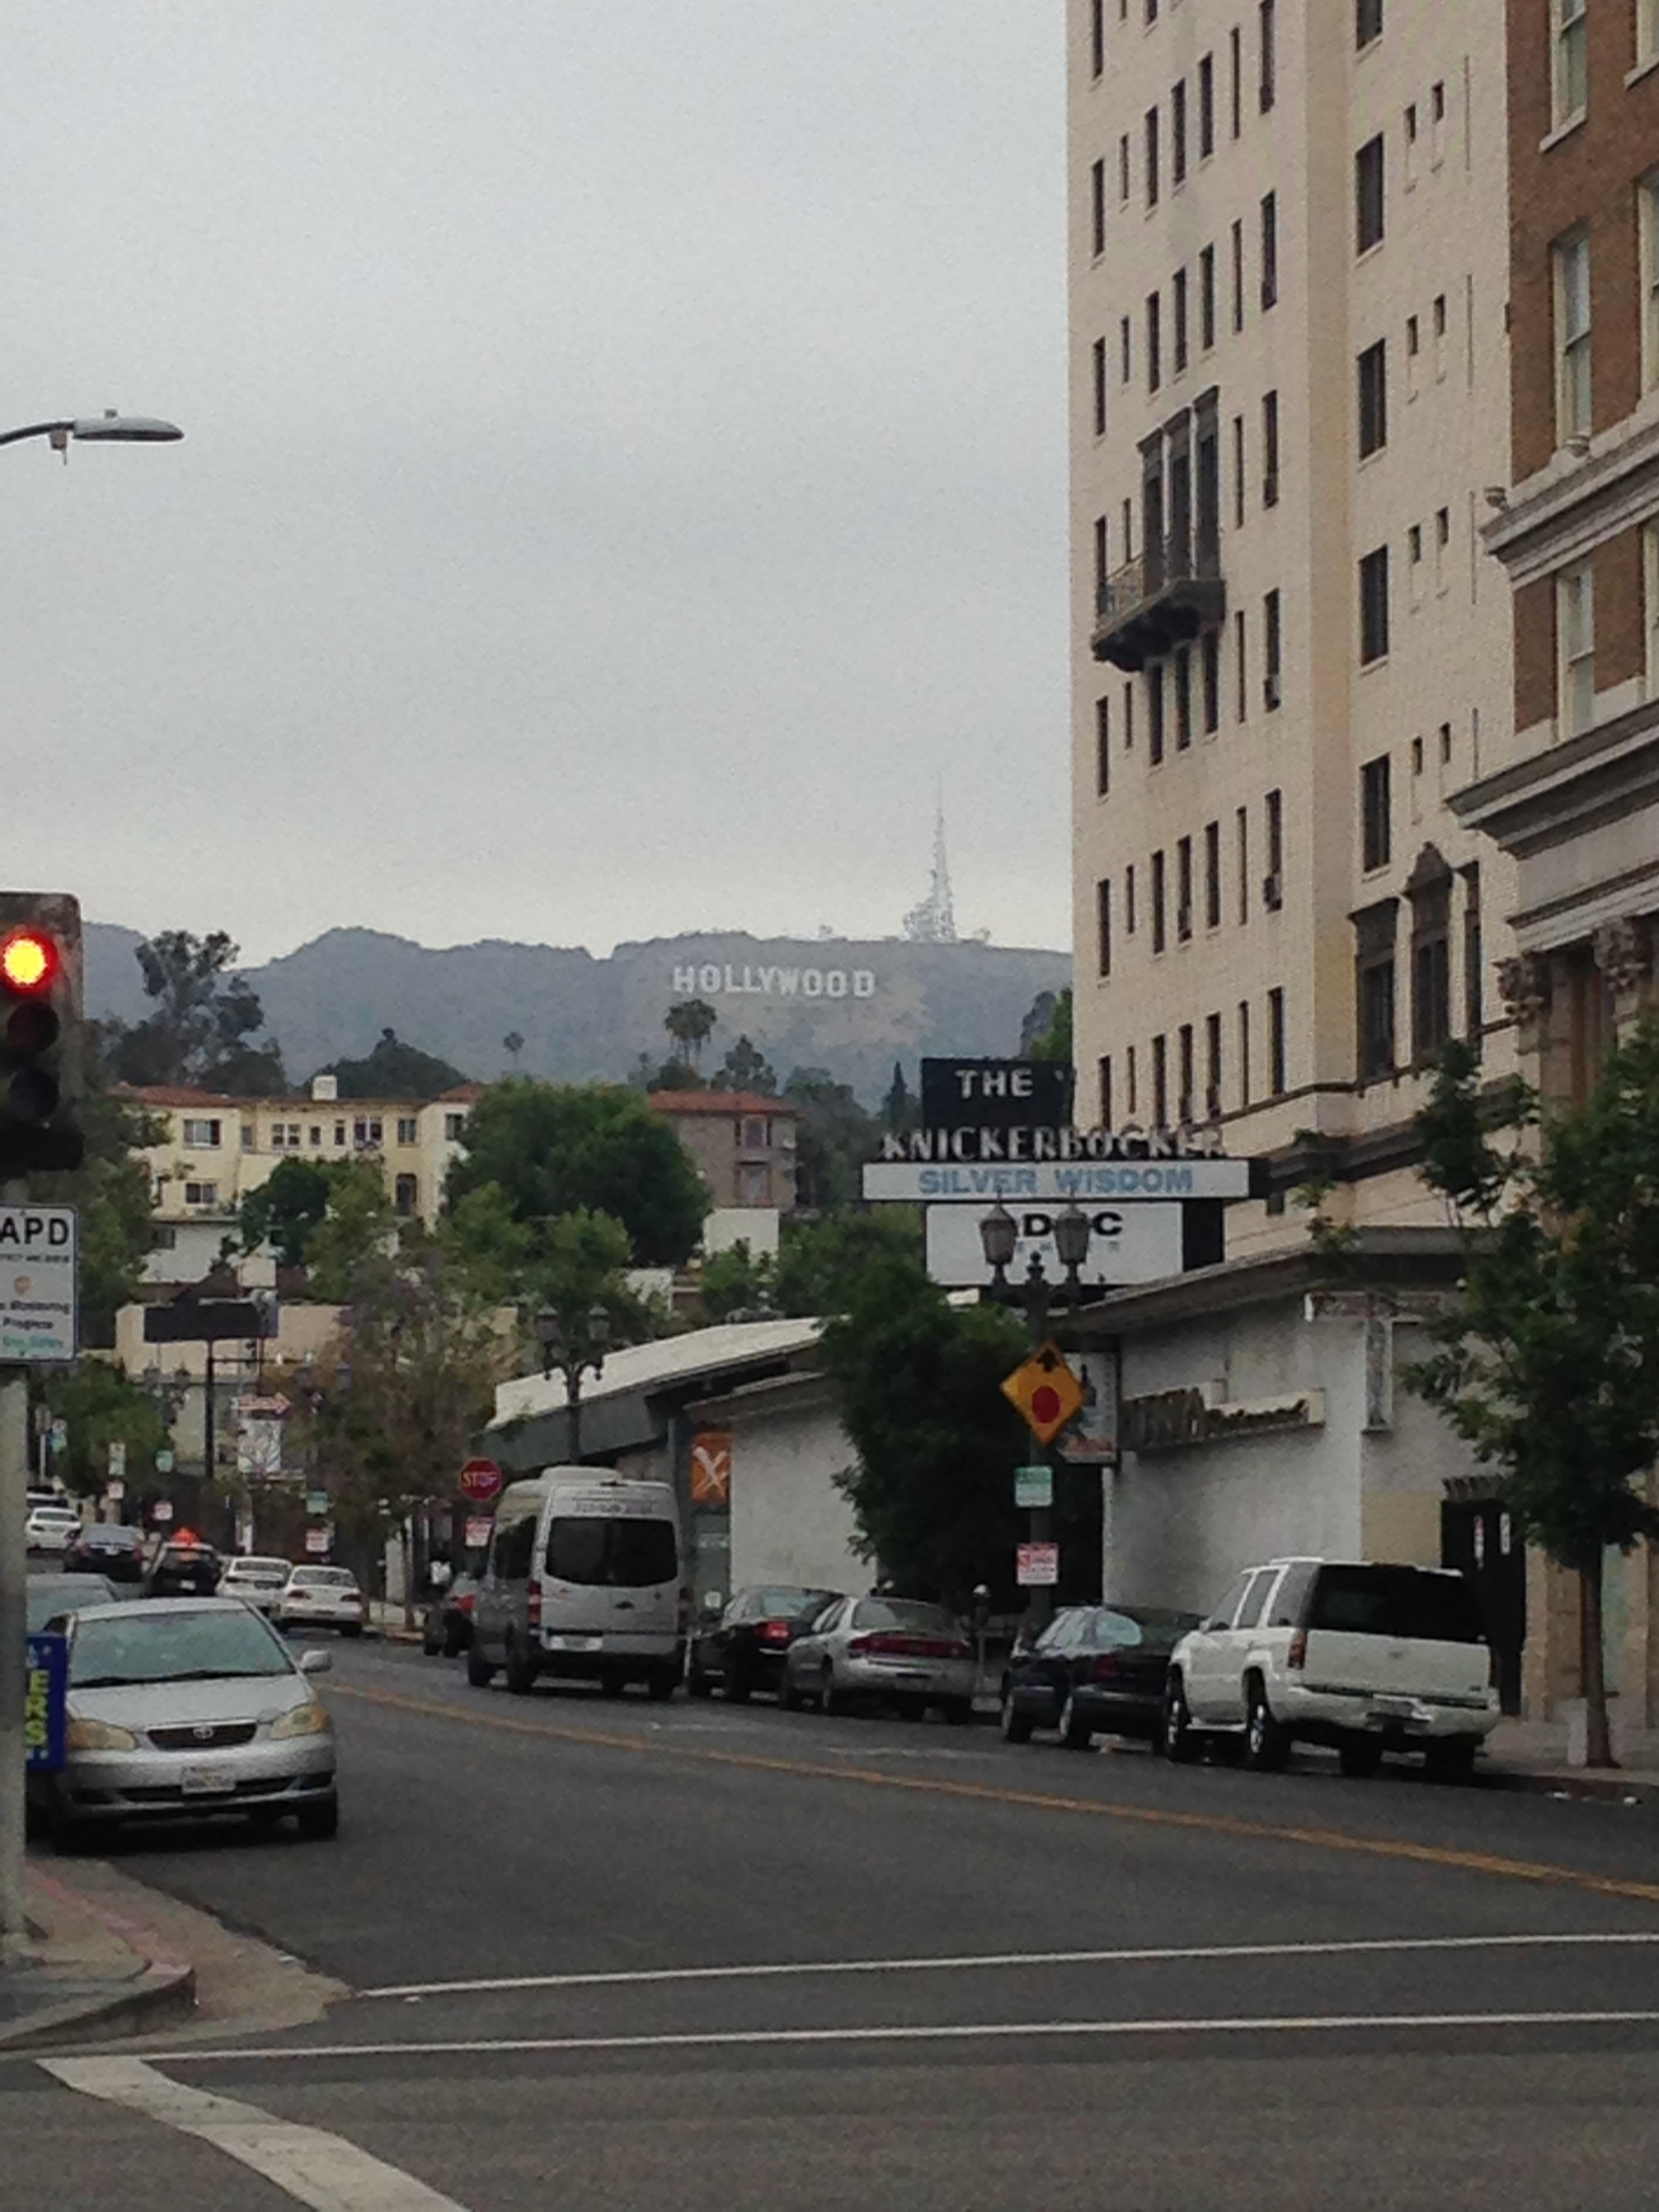 ^ Hollywood Hills